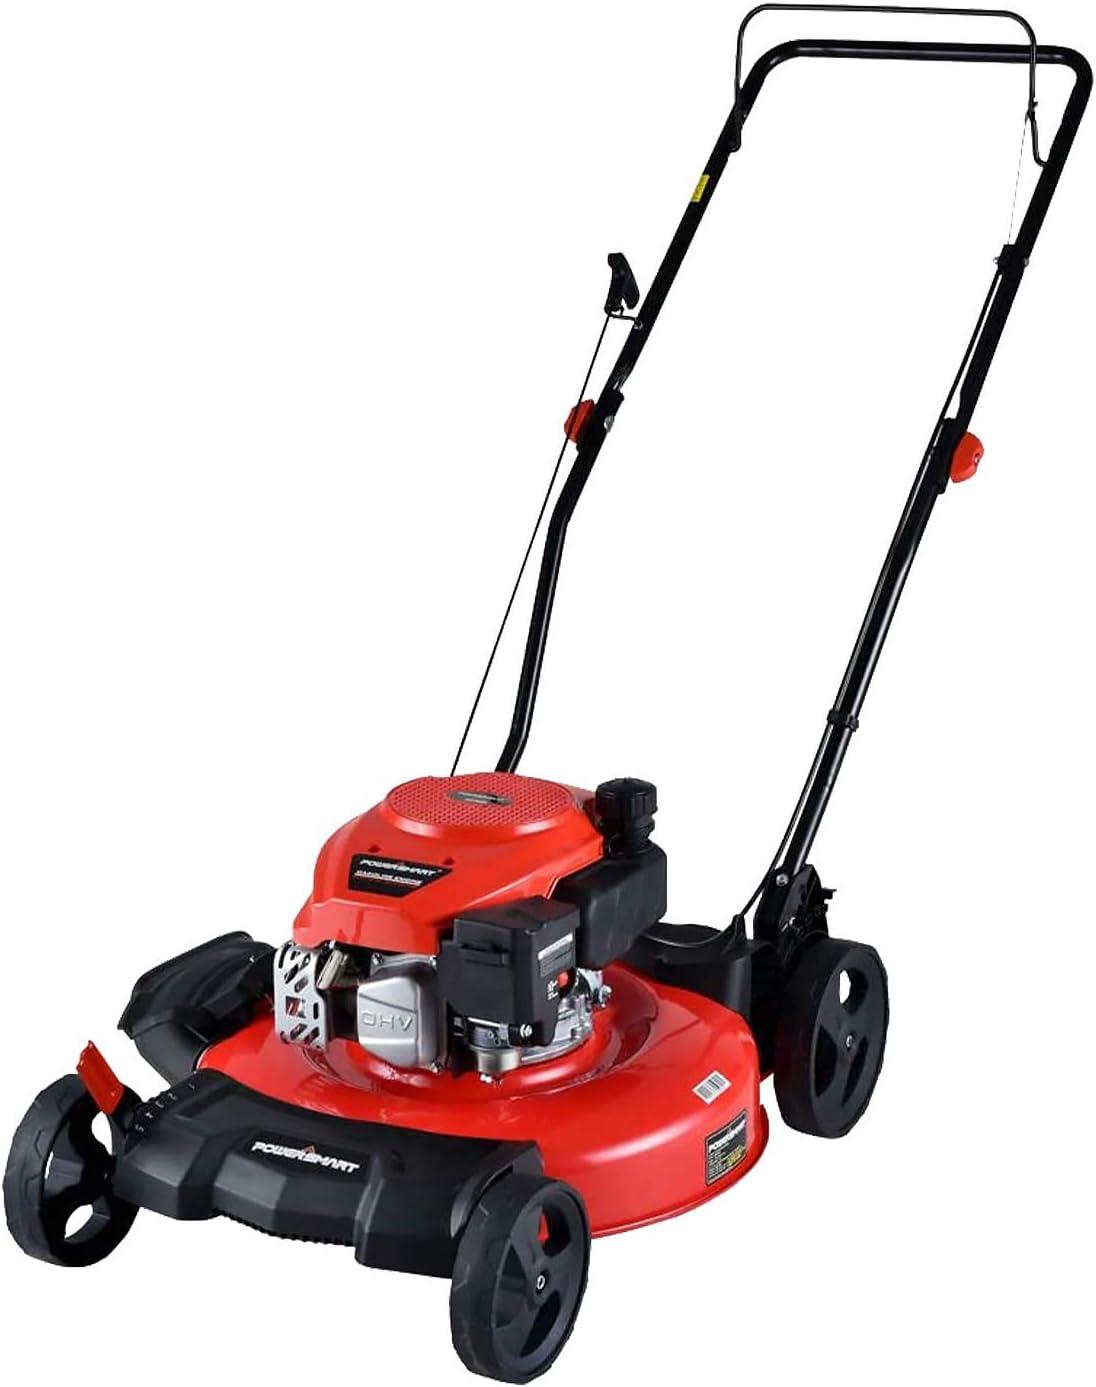 PowerSmart 21-inch & 170CC, Gas Powered Push Lawn Mower